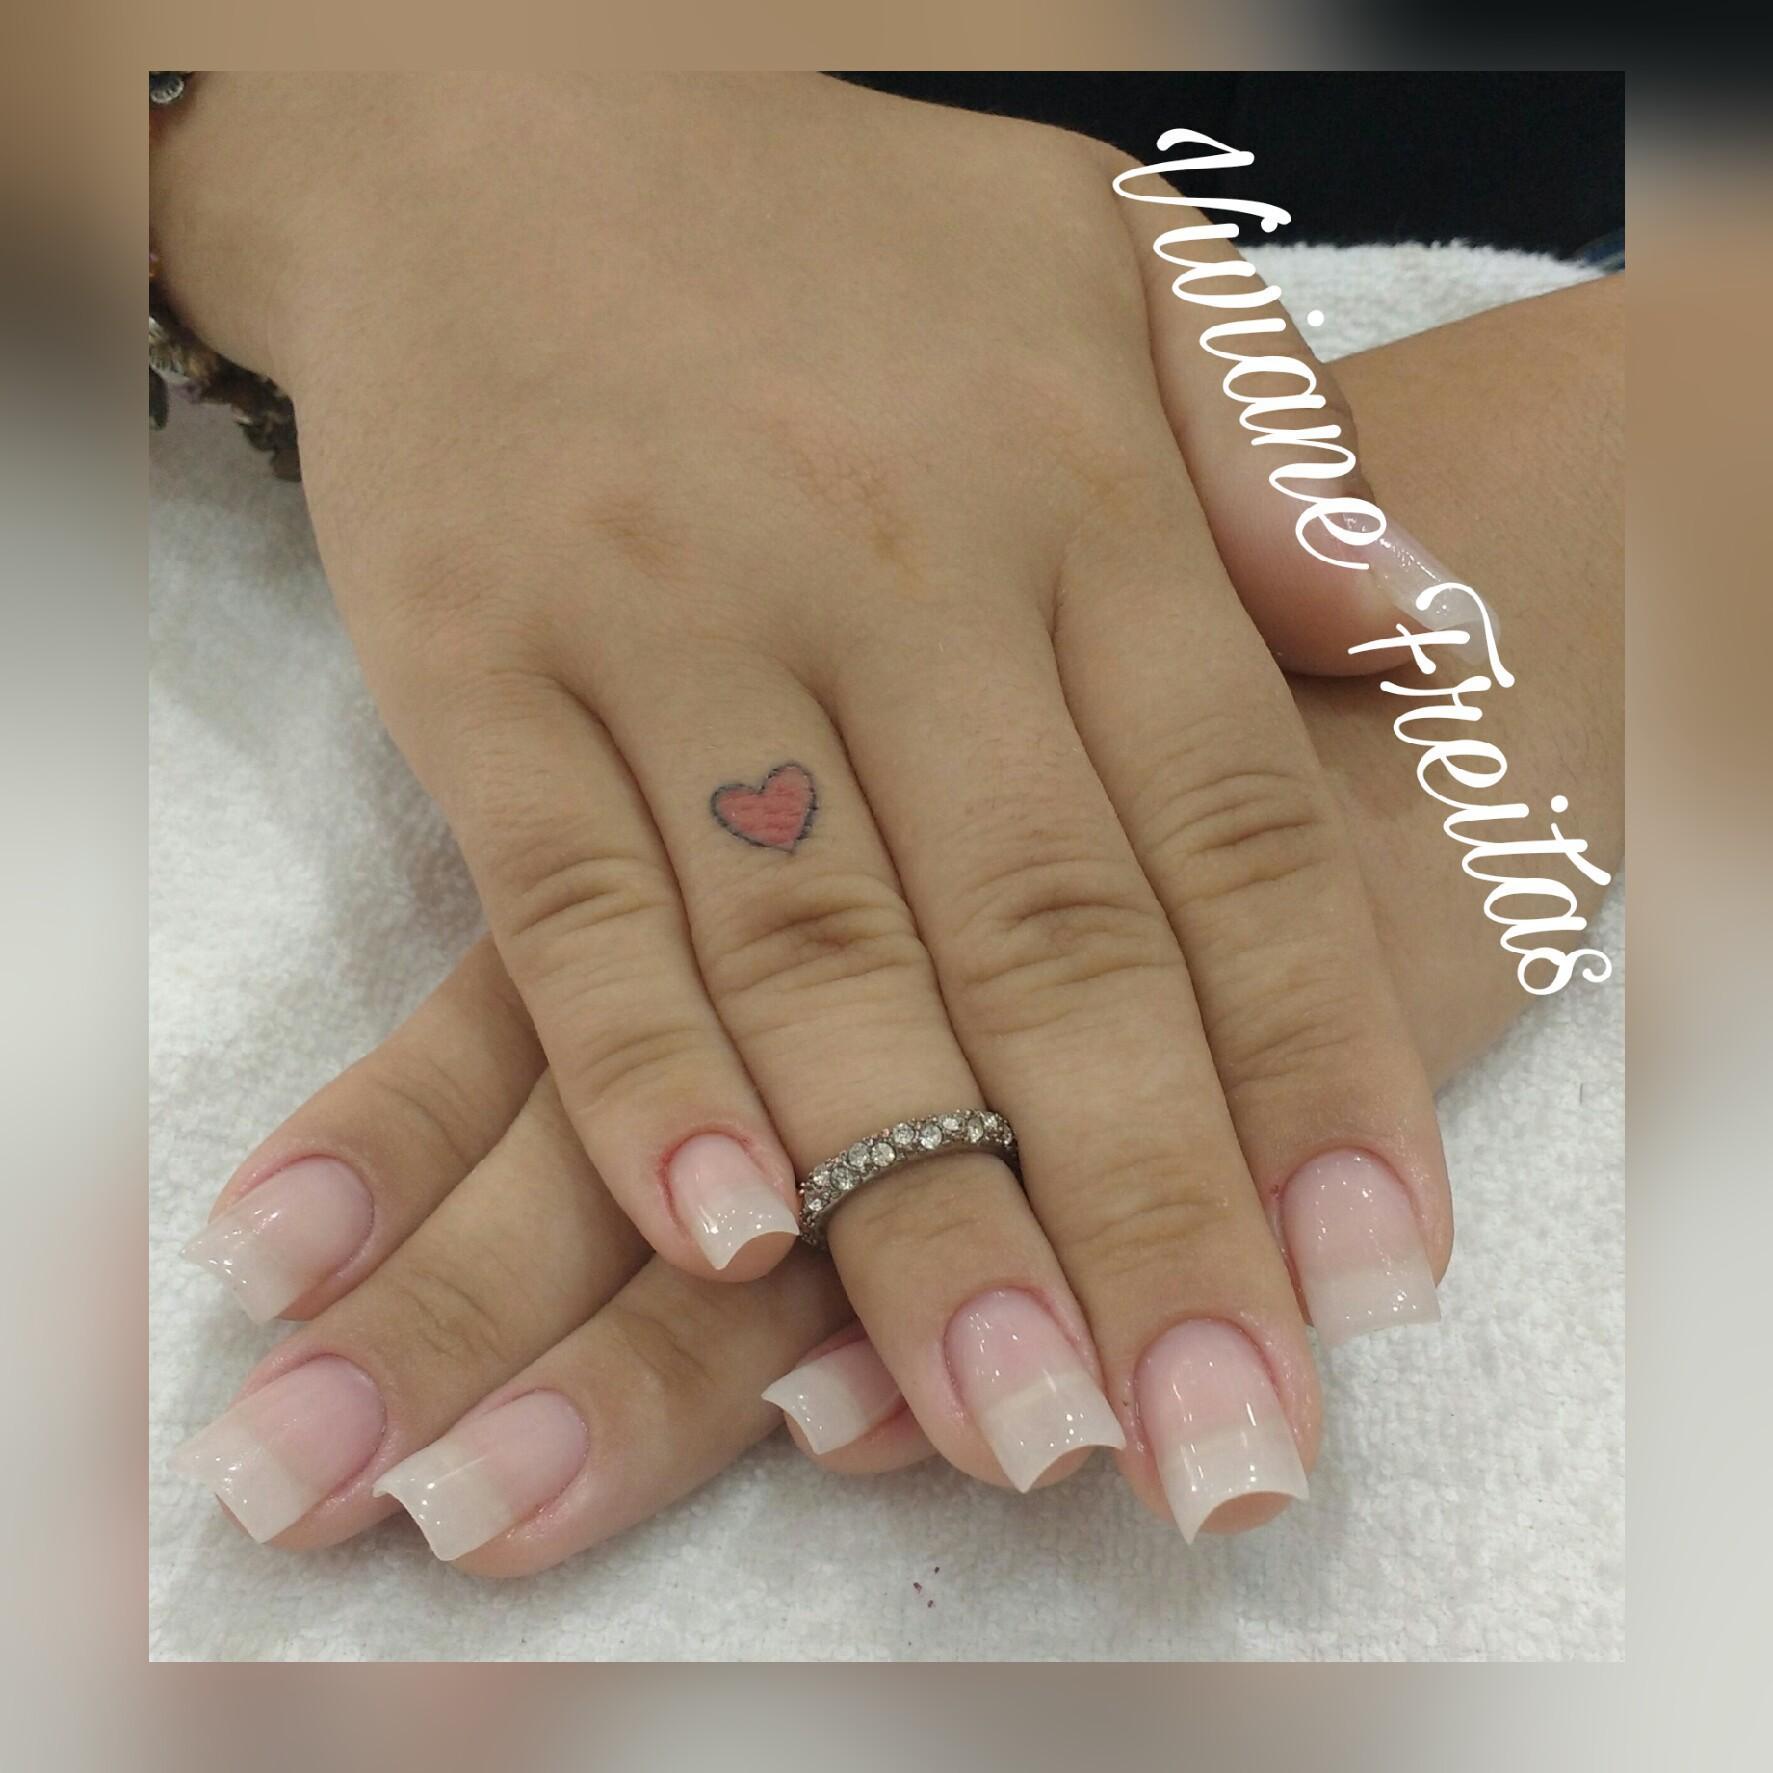 Estrutura em gel unha manicure e pedicure